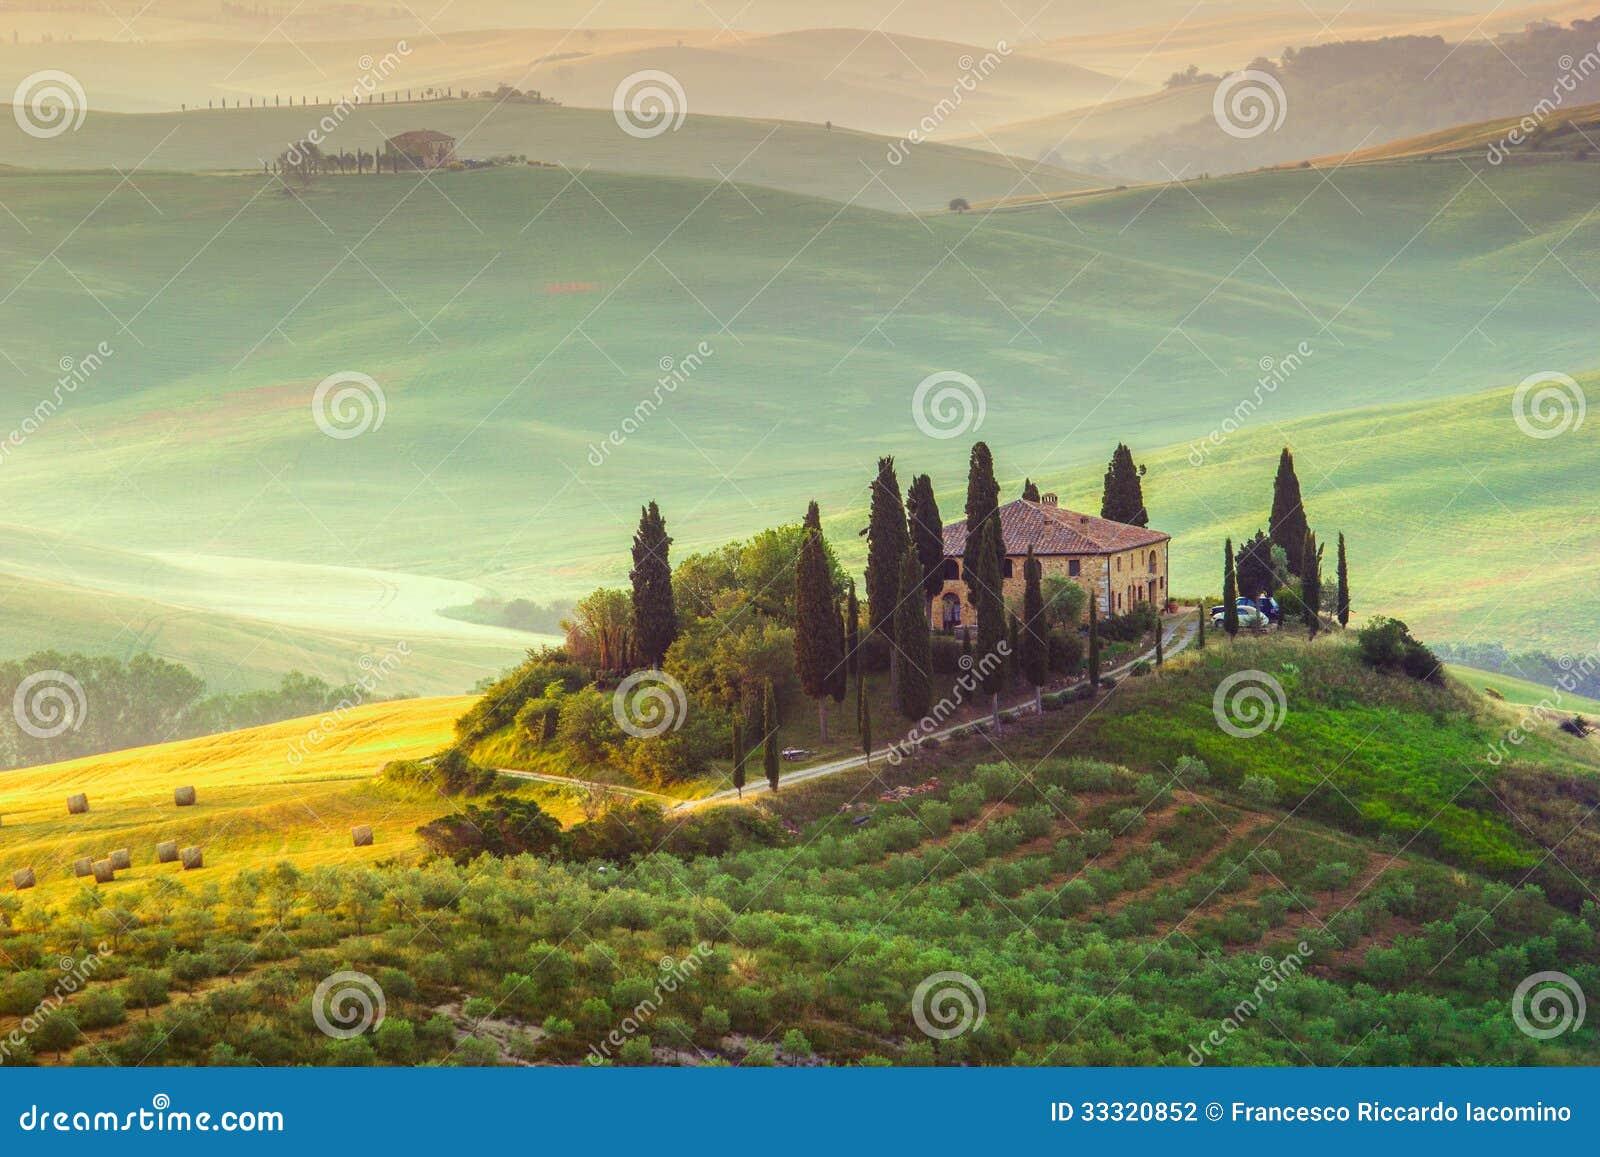 Download Tuscany, Landscape stock photo. Image of morning, farm - 33320852